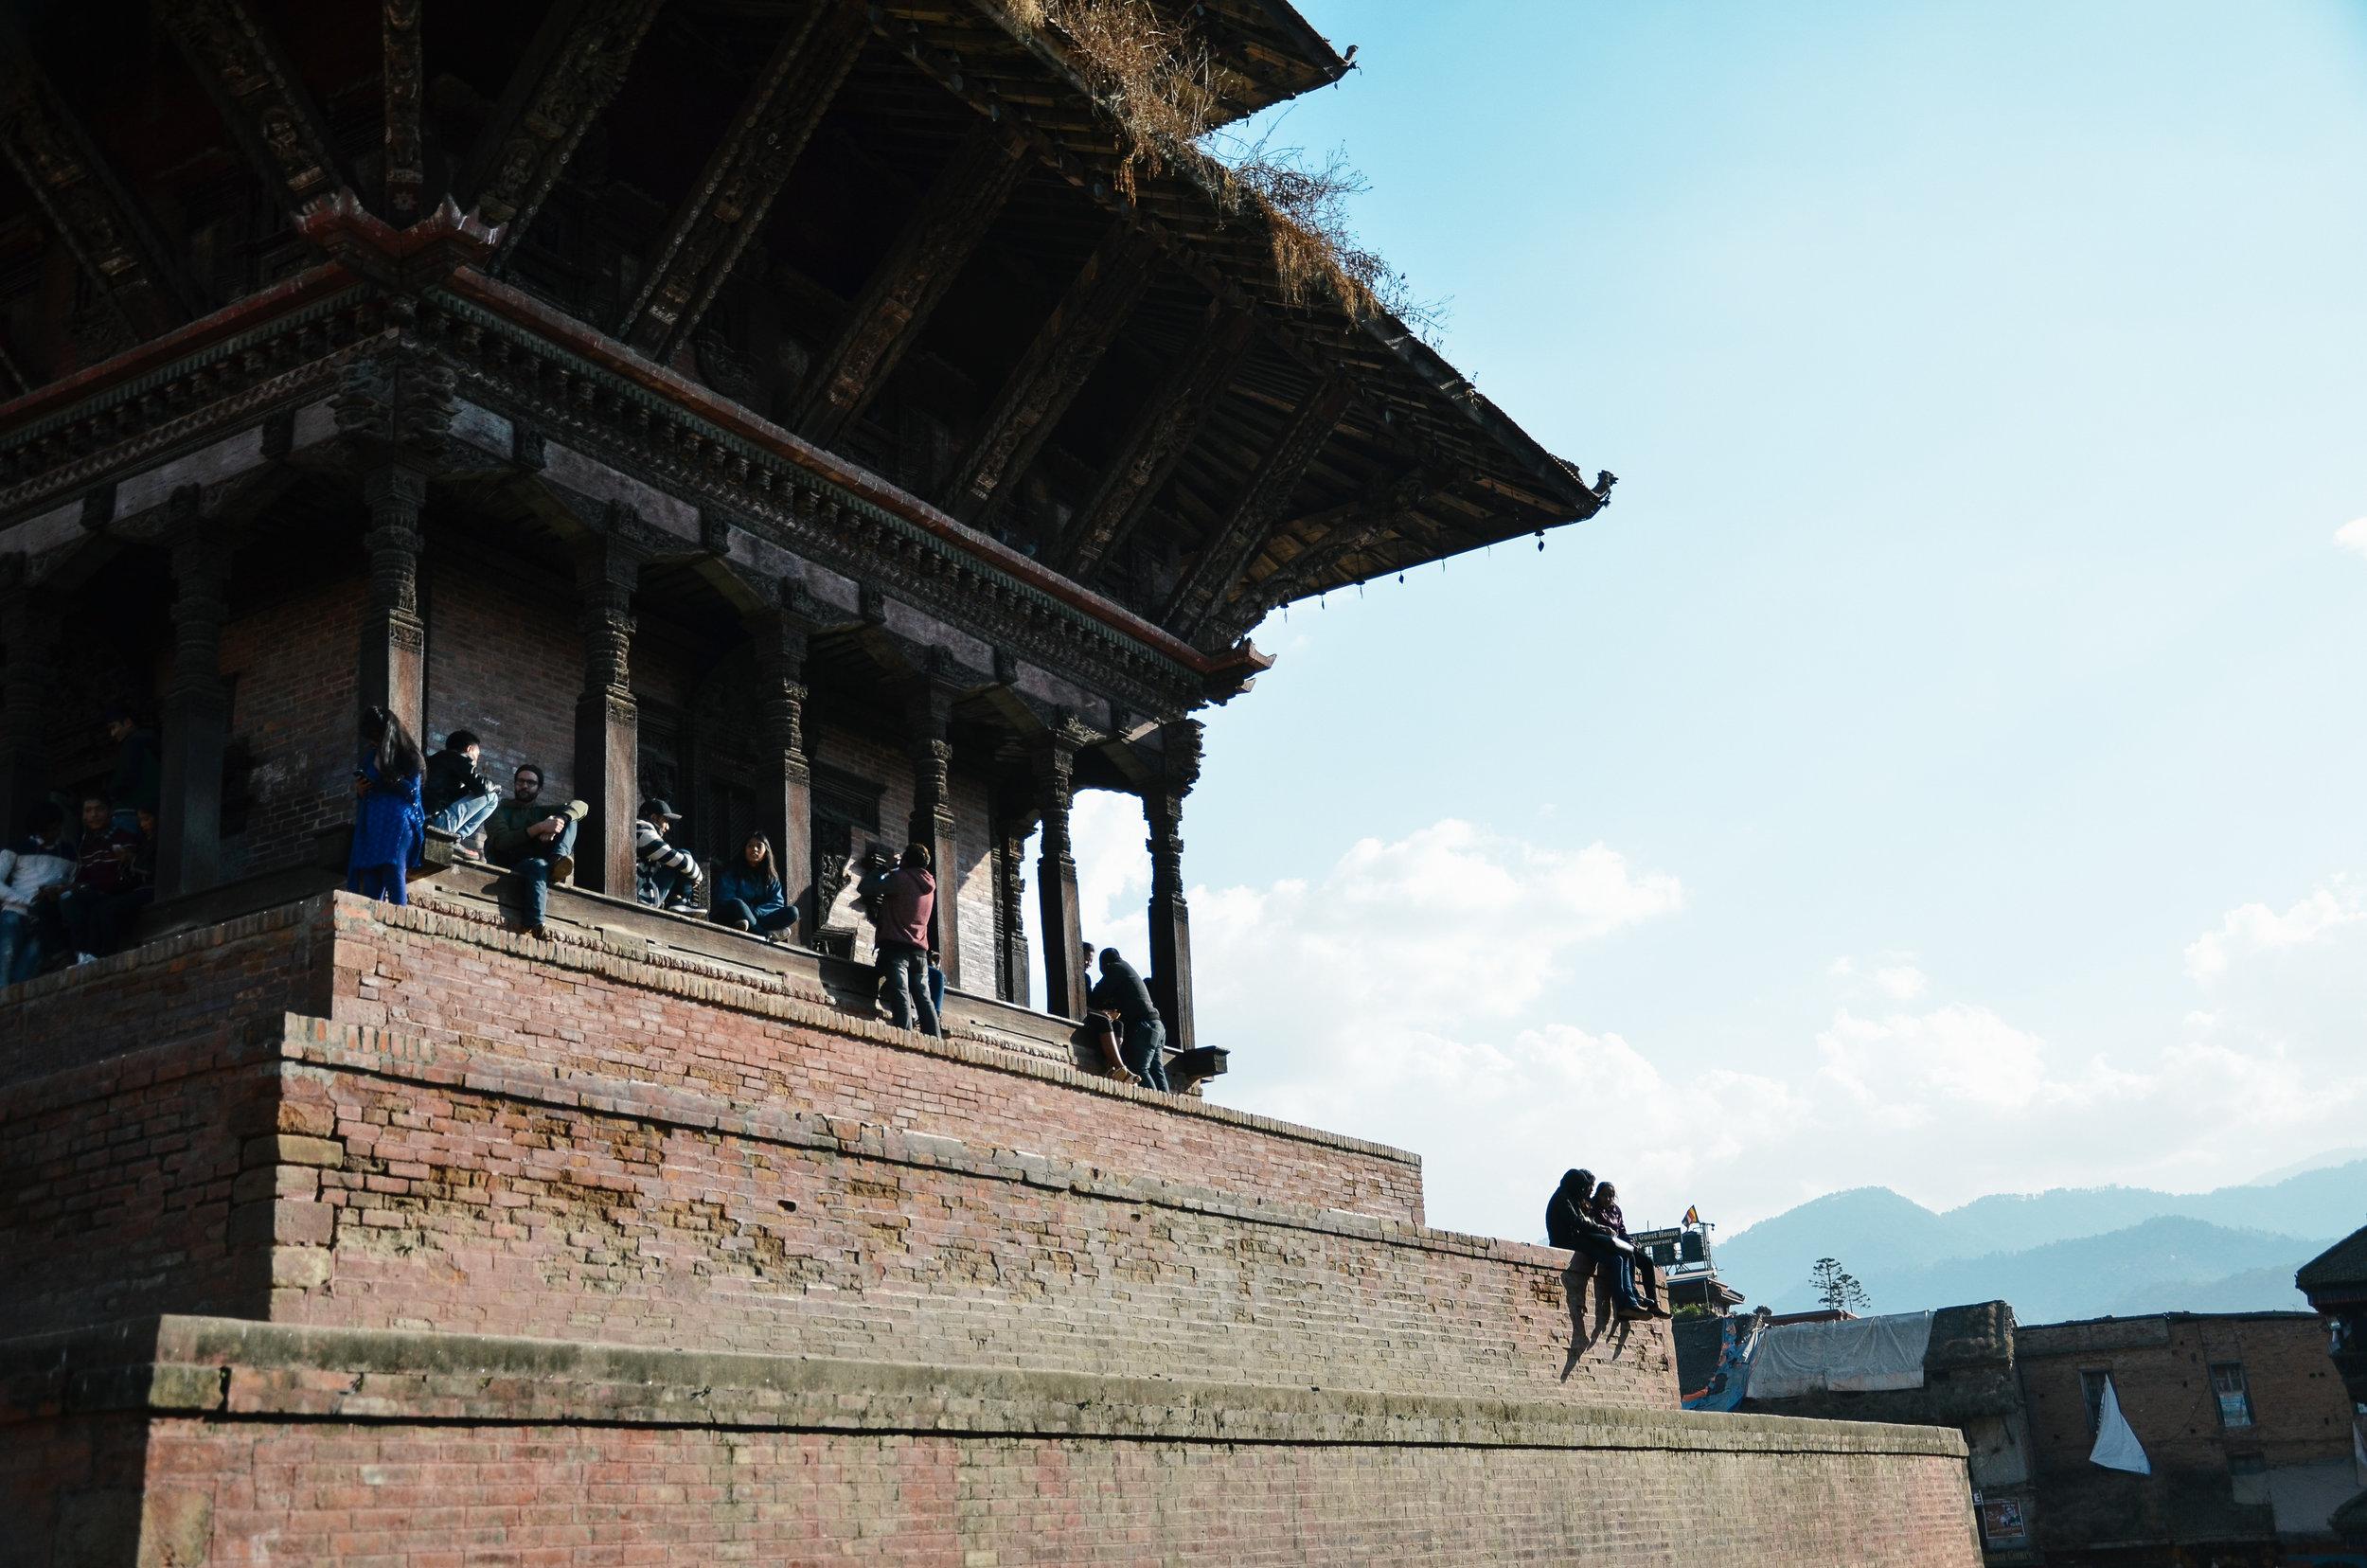 10-things-to-know-kathmandu-nepal-lifeonpine_DSC_0664.jpg